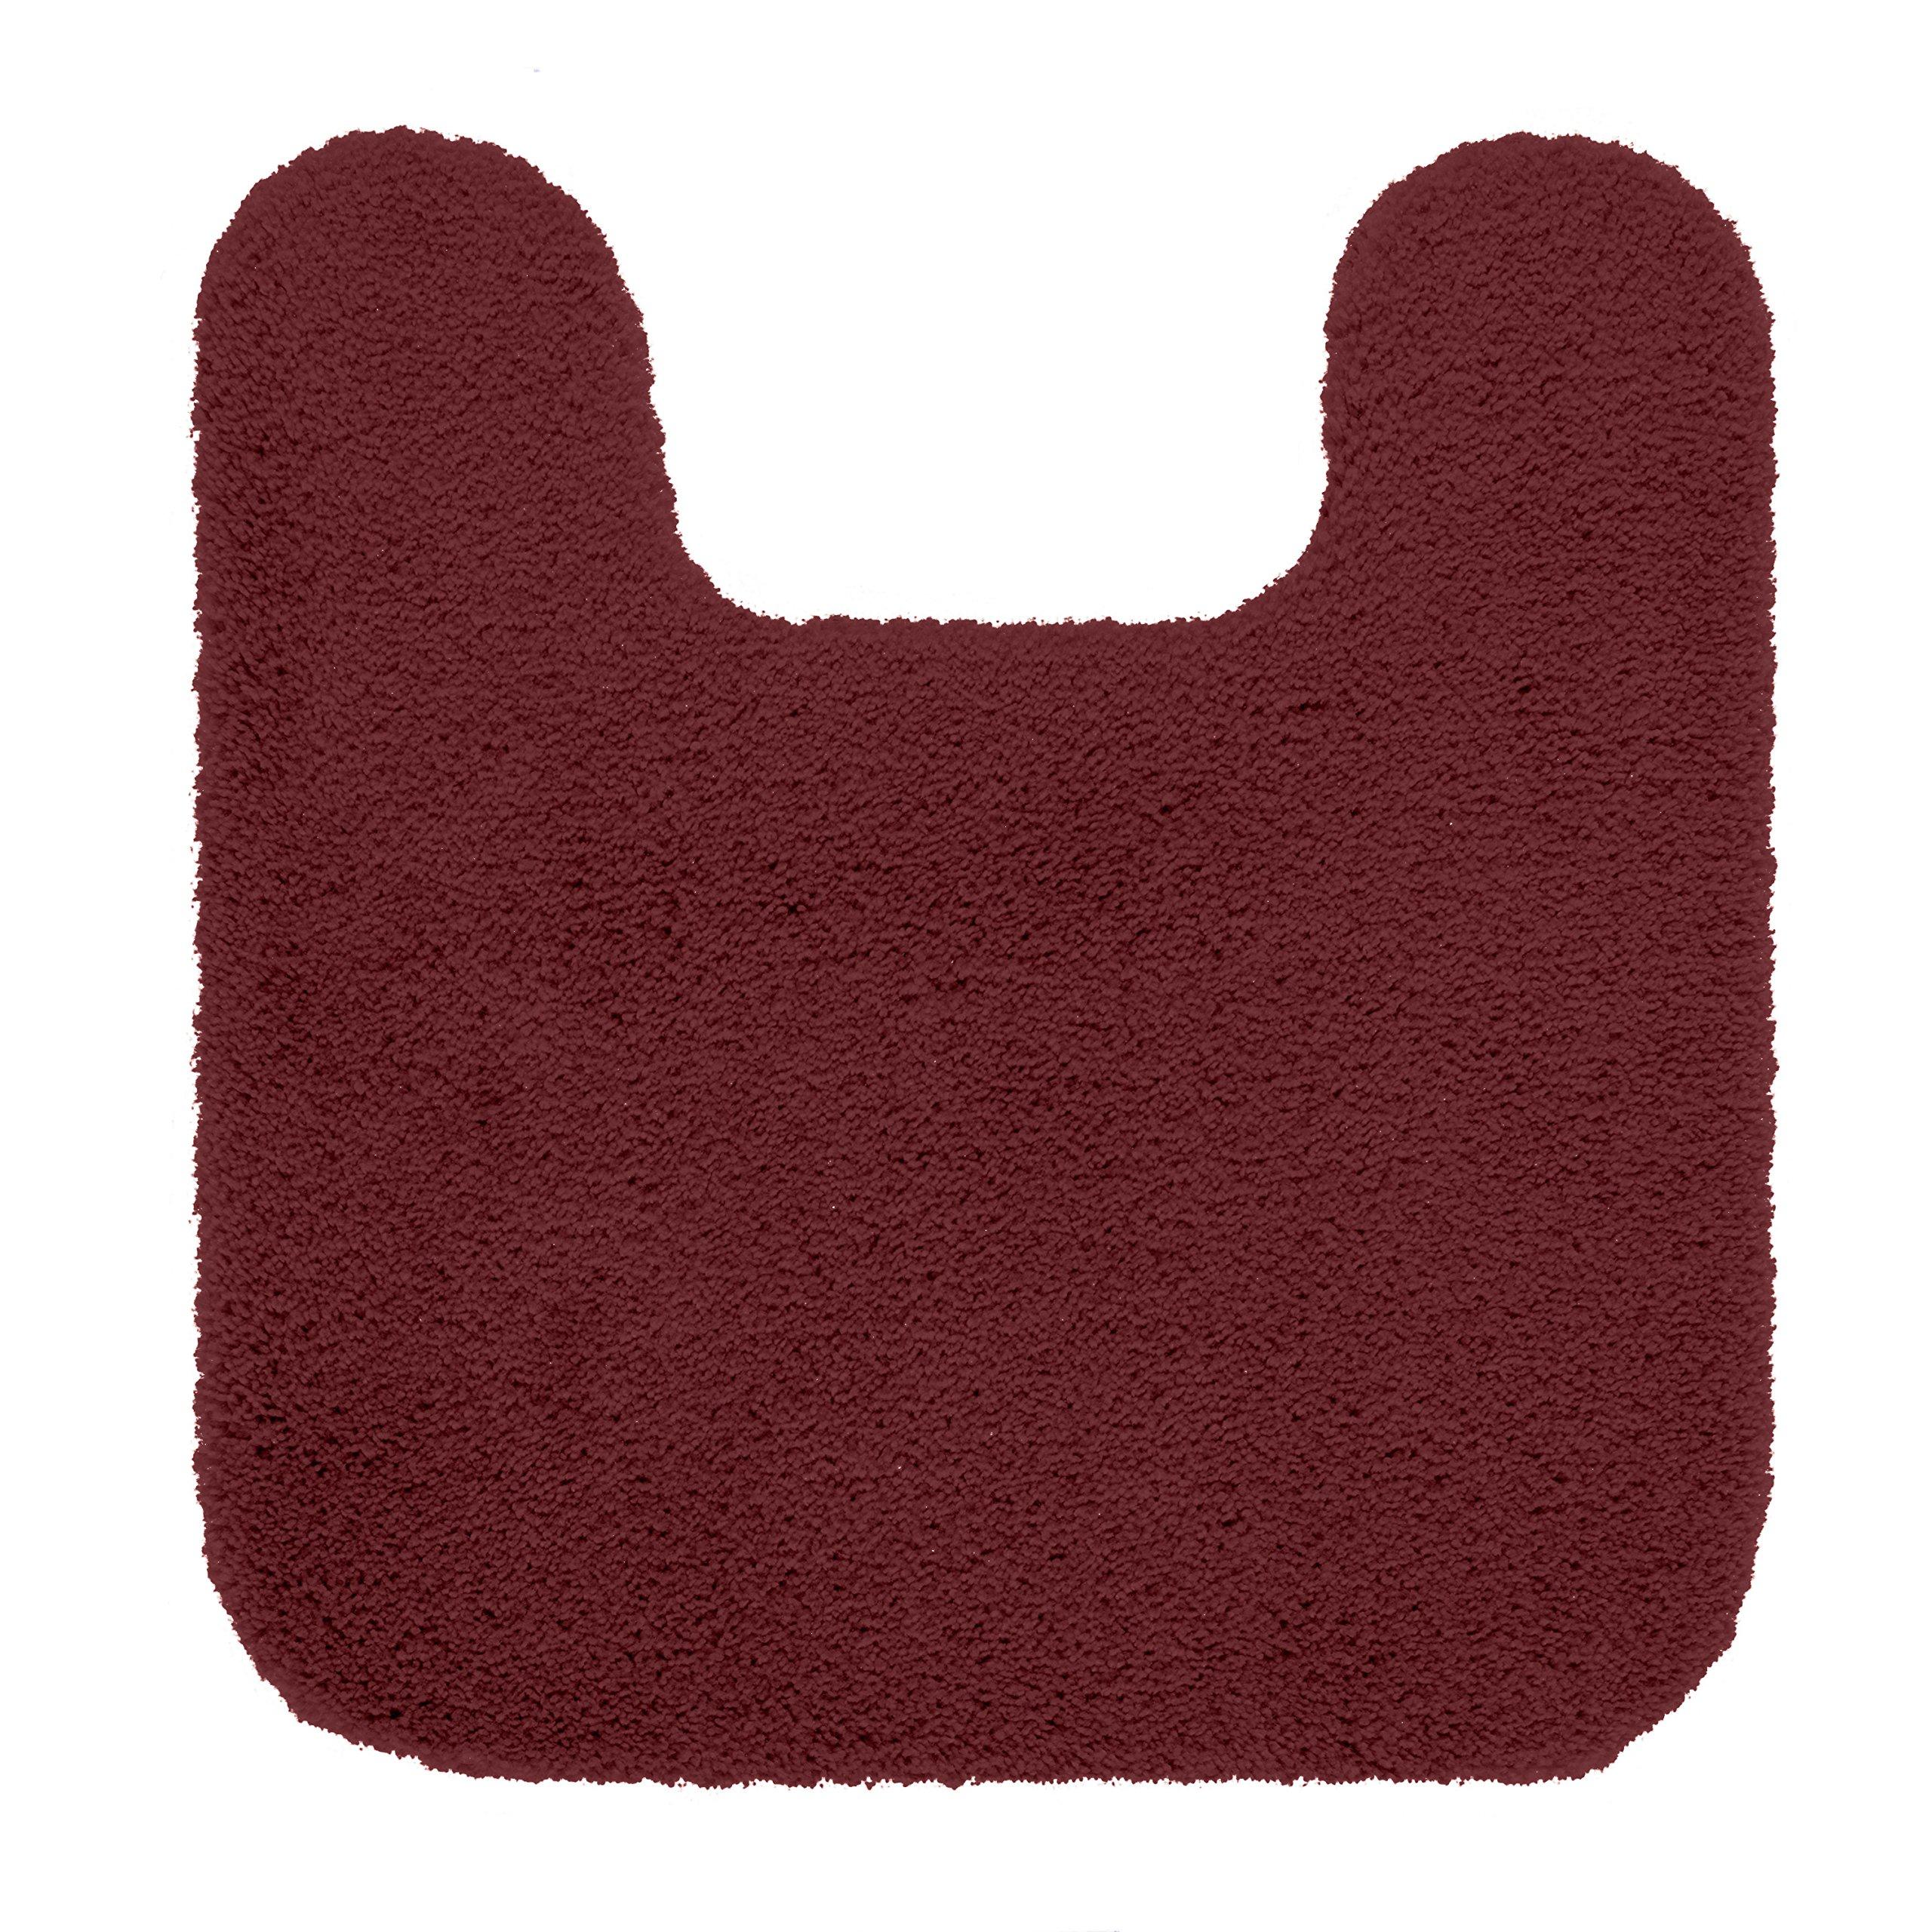 "Maples Rugs Cloud Bath 20"" x 21.5"" Contour Non Slip Toilet Rug [Made in USA] Machine Washable Soft Bath Mat, Crimson Victory"